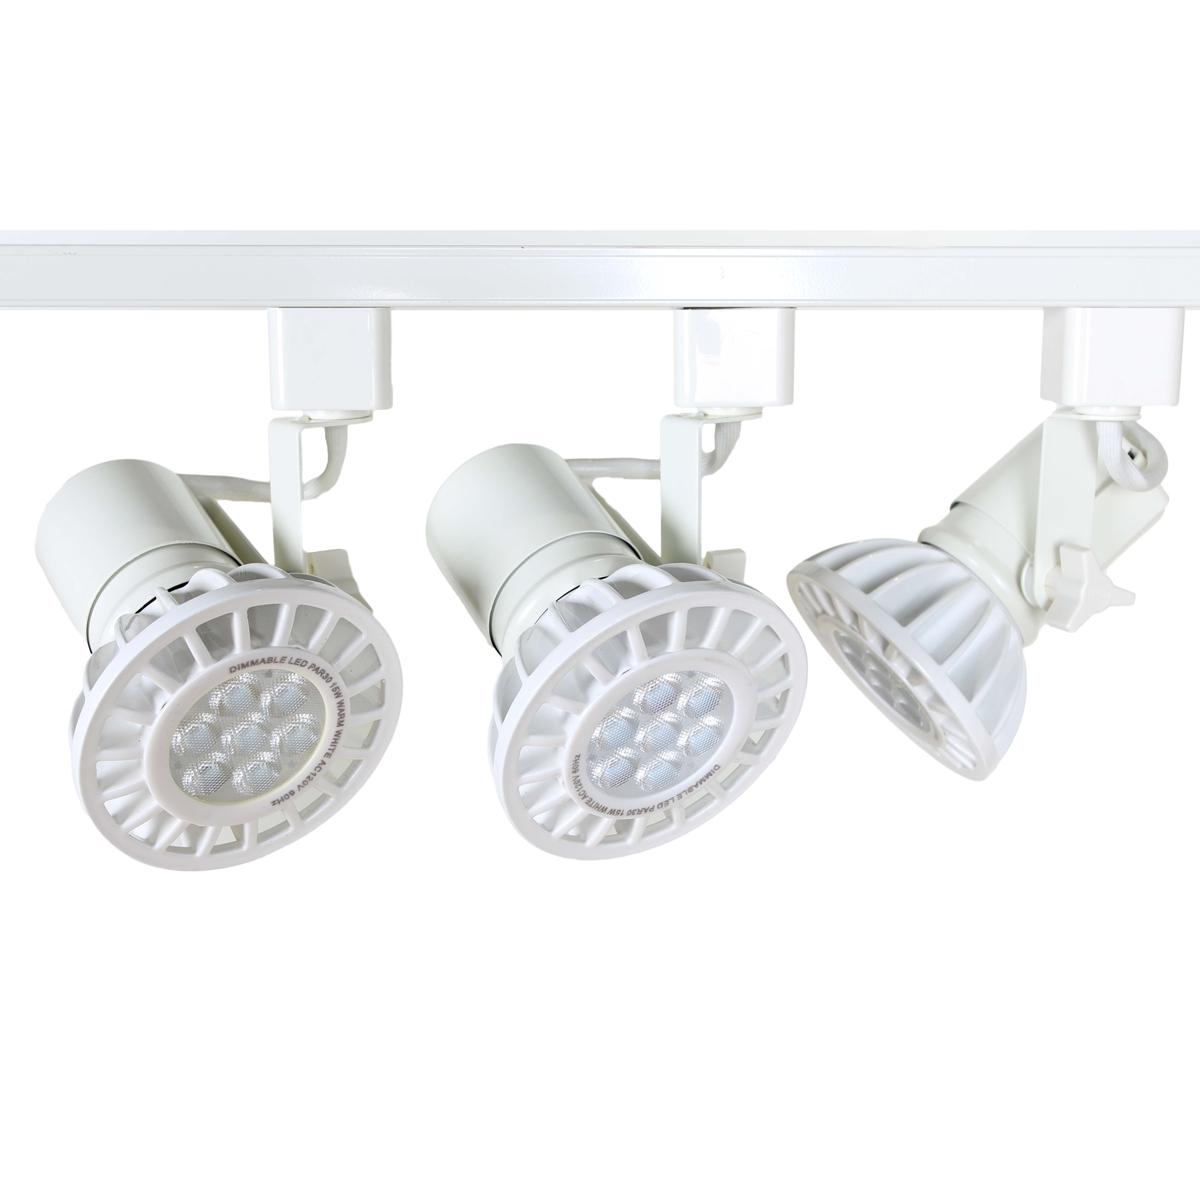 Led Track Lighting Kits Led Par30 Track Lighting Systems Ht 50047 Universal Track Head Spot Lights Direct Lighting Com 888 628 8166